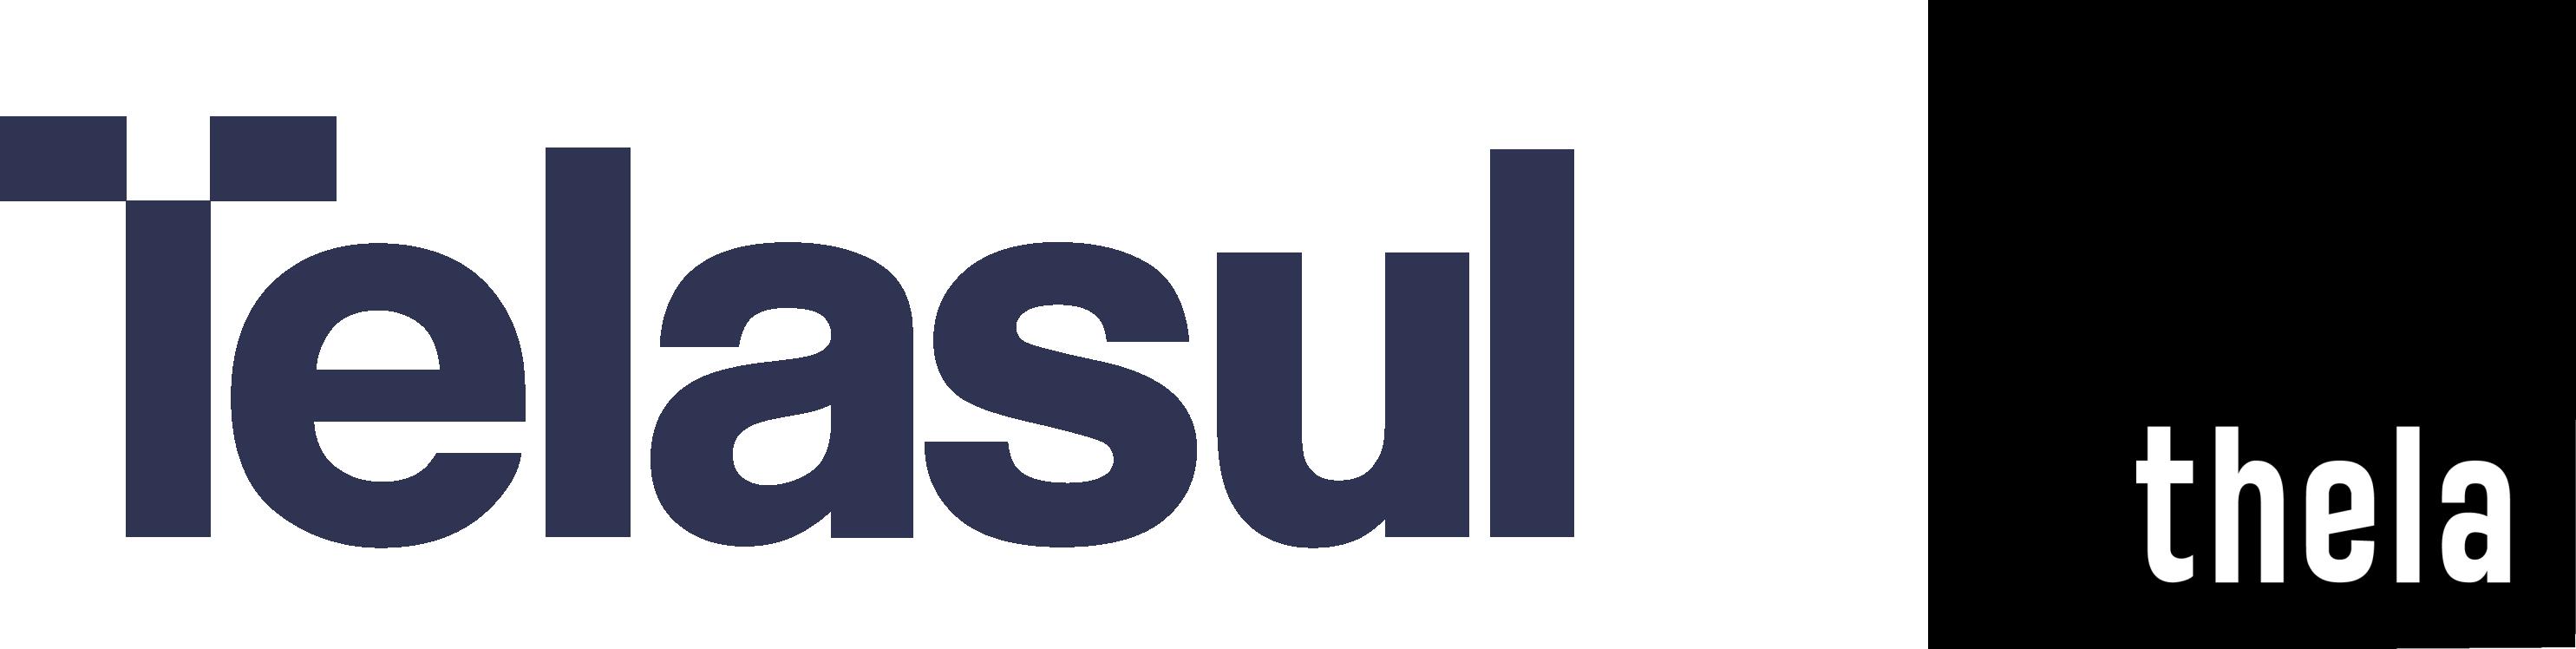 Telasul